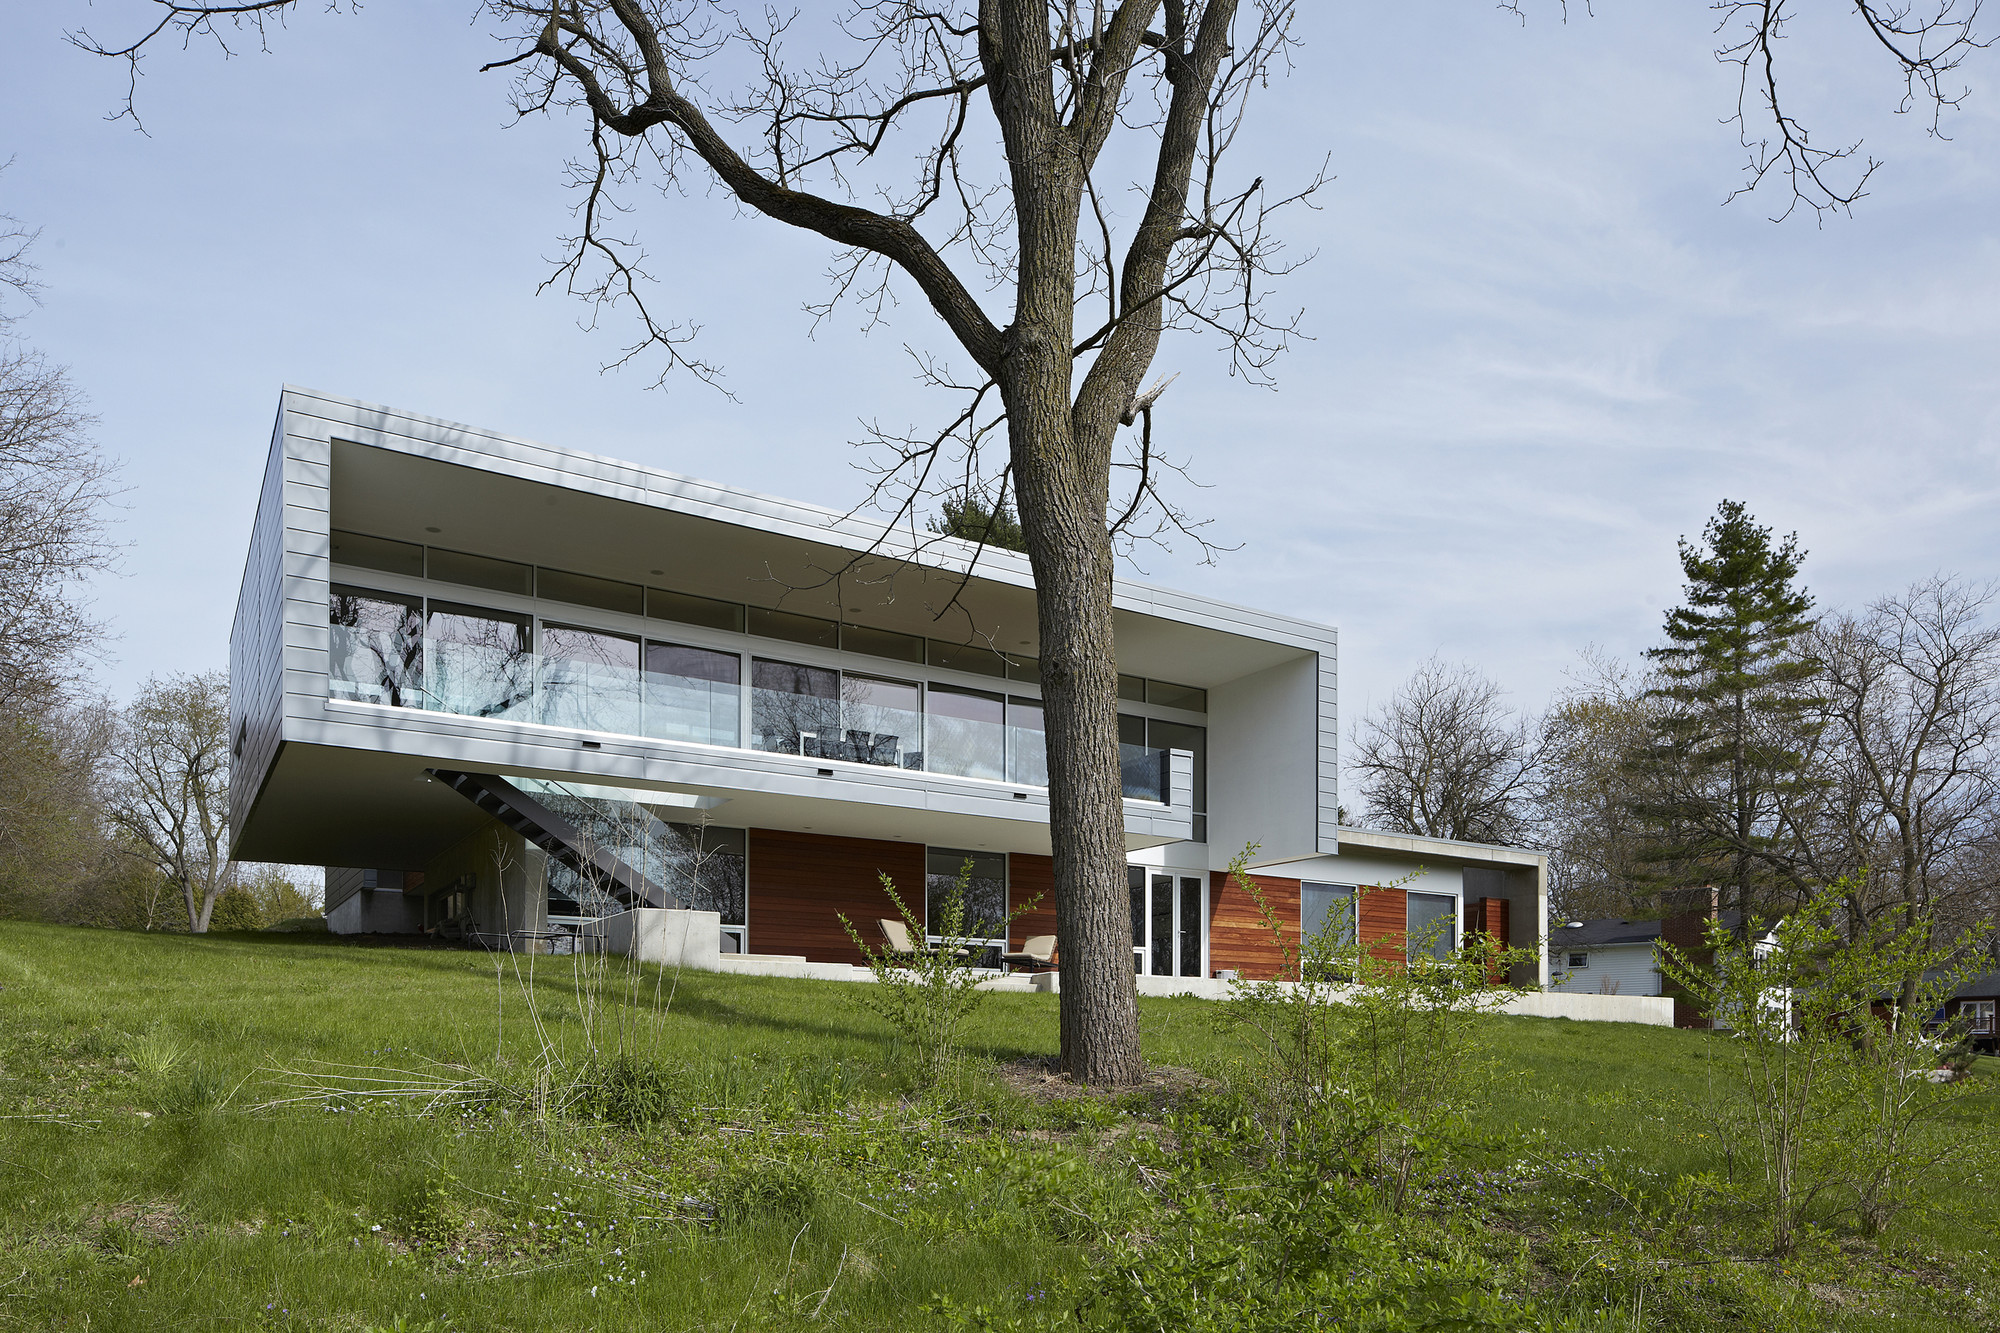 galer a de casa con vista al r o studio dwell architects 4. Black Bedroom Furniture Sets. Home Design Ideas